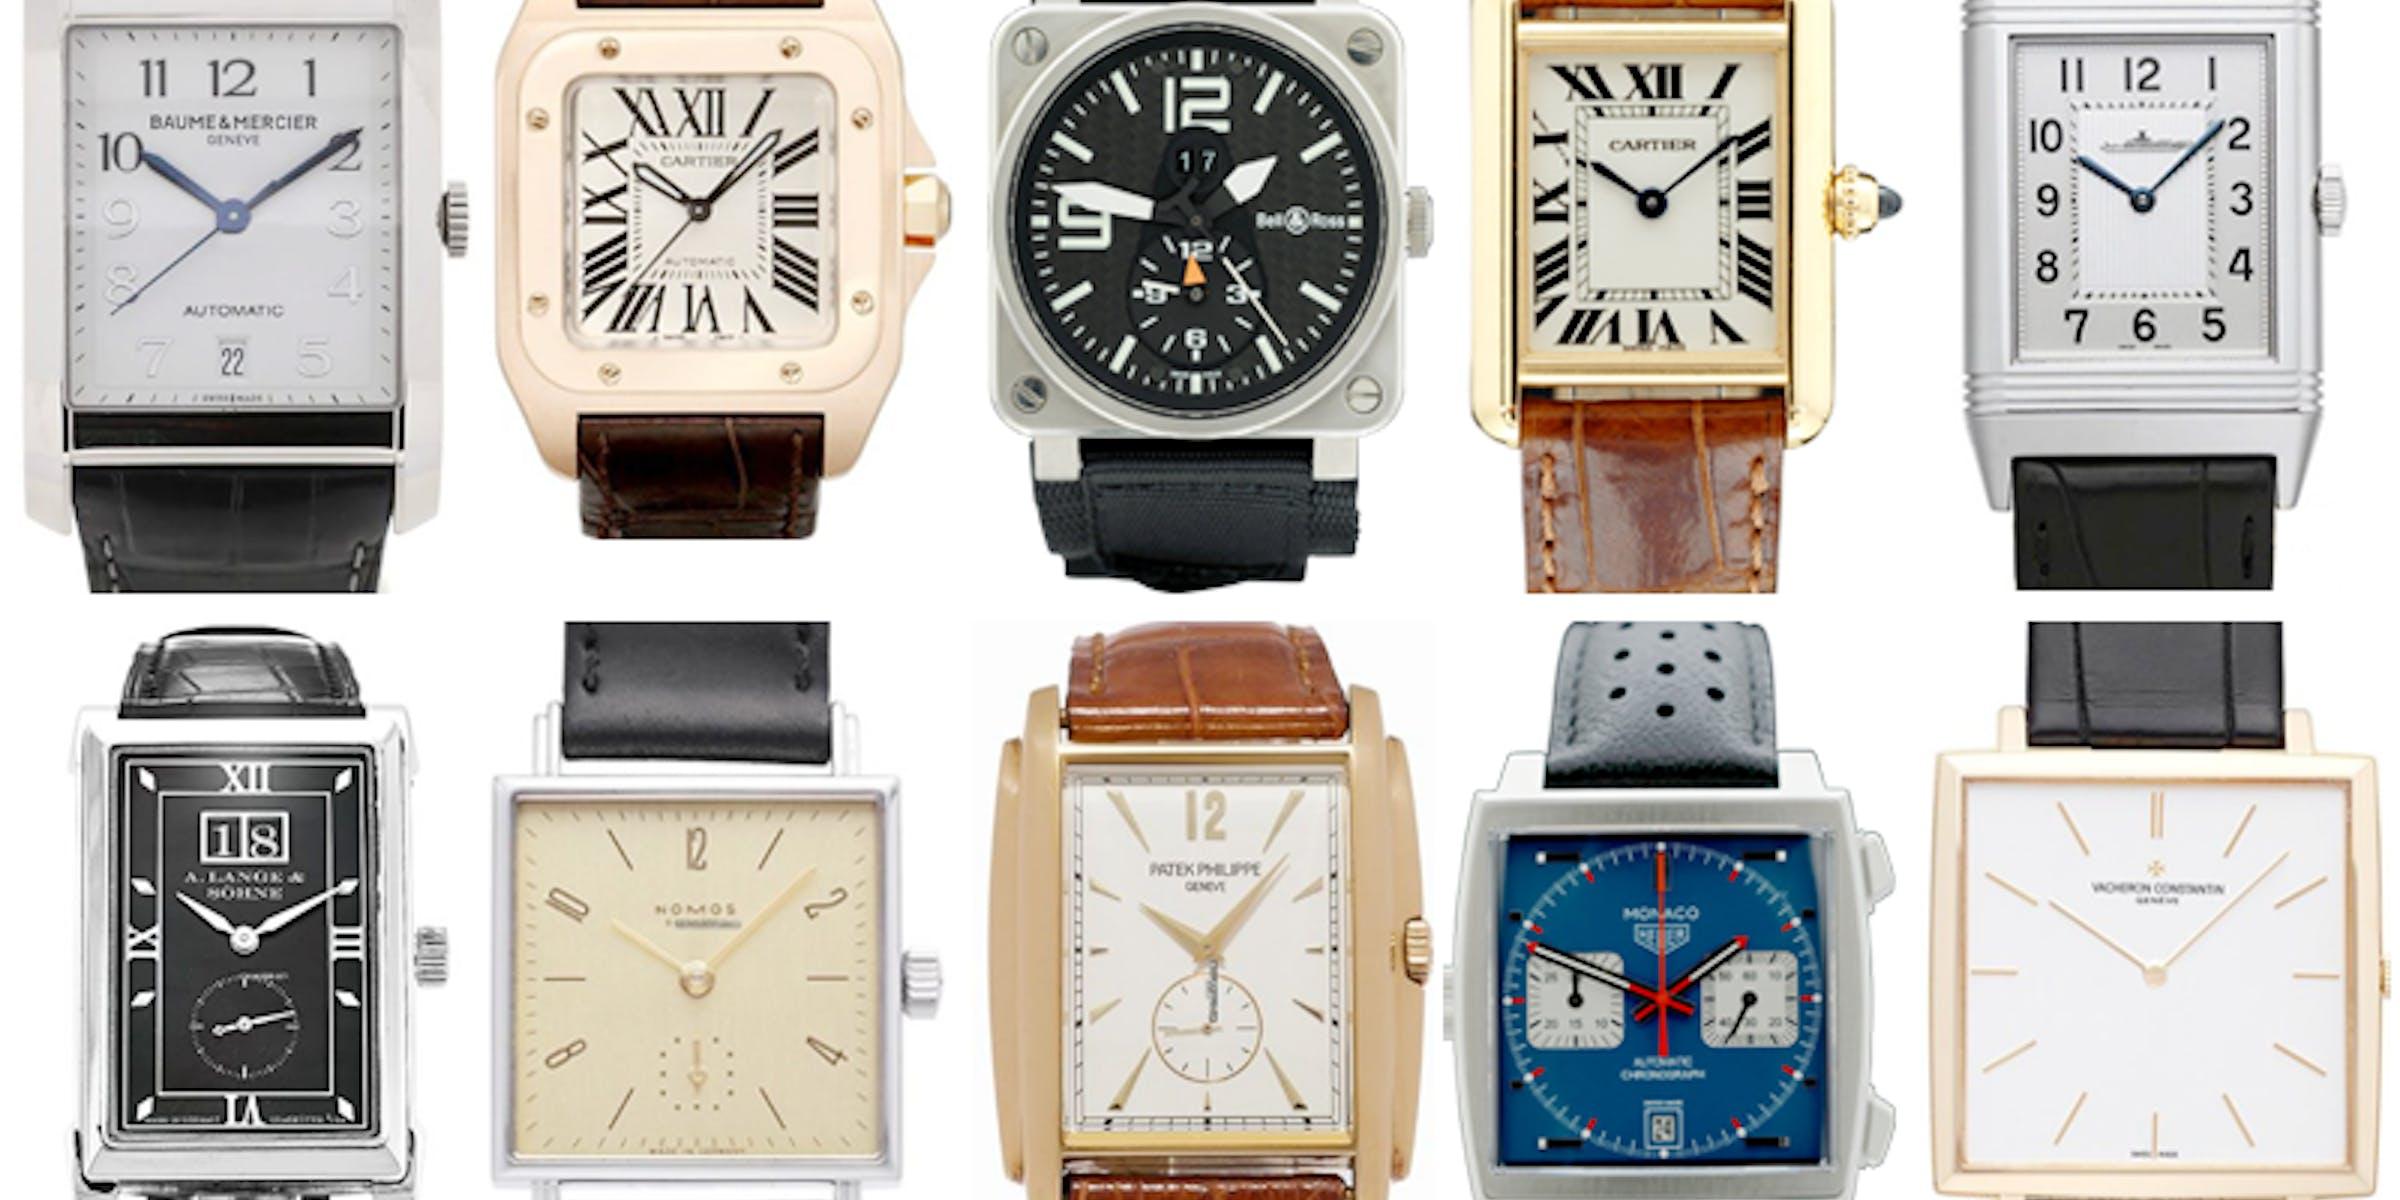 Top 10 Rectangular Watches